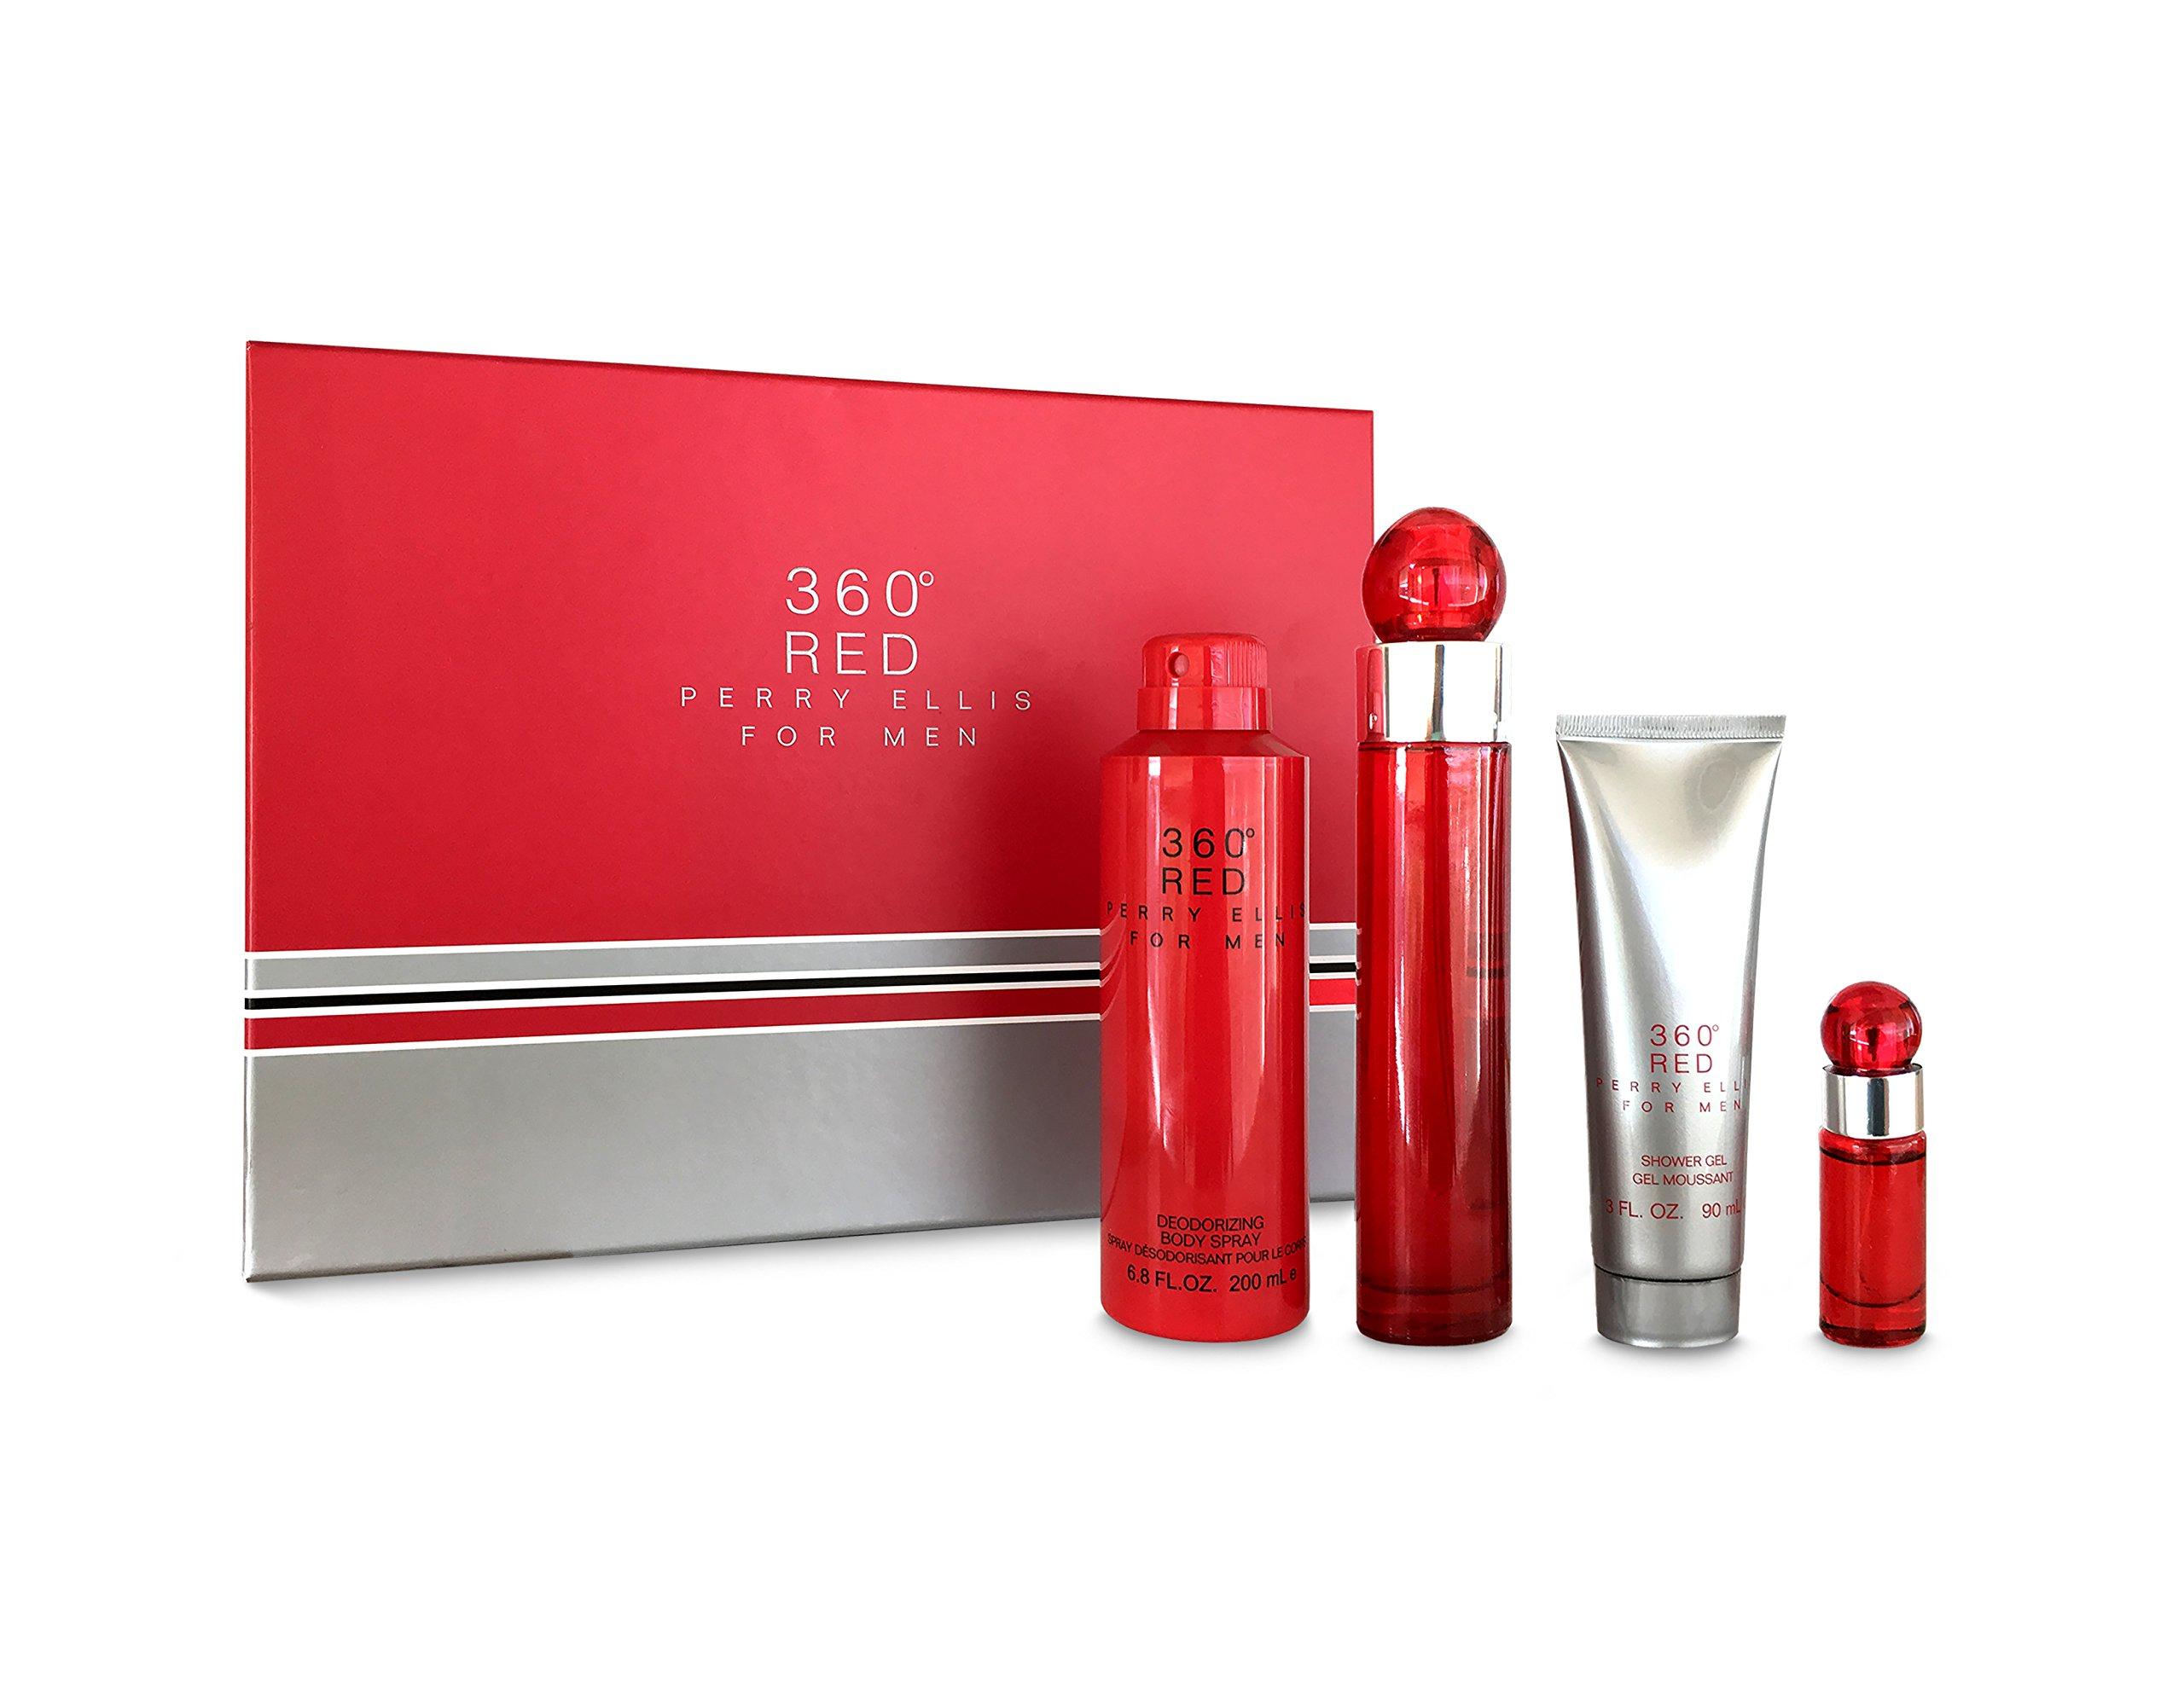 Perry Ellis Fragrances 360 Red 4 Piece Gift Set for Men